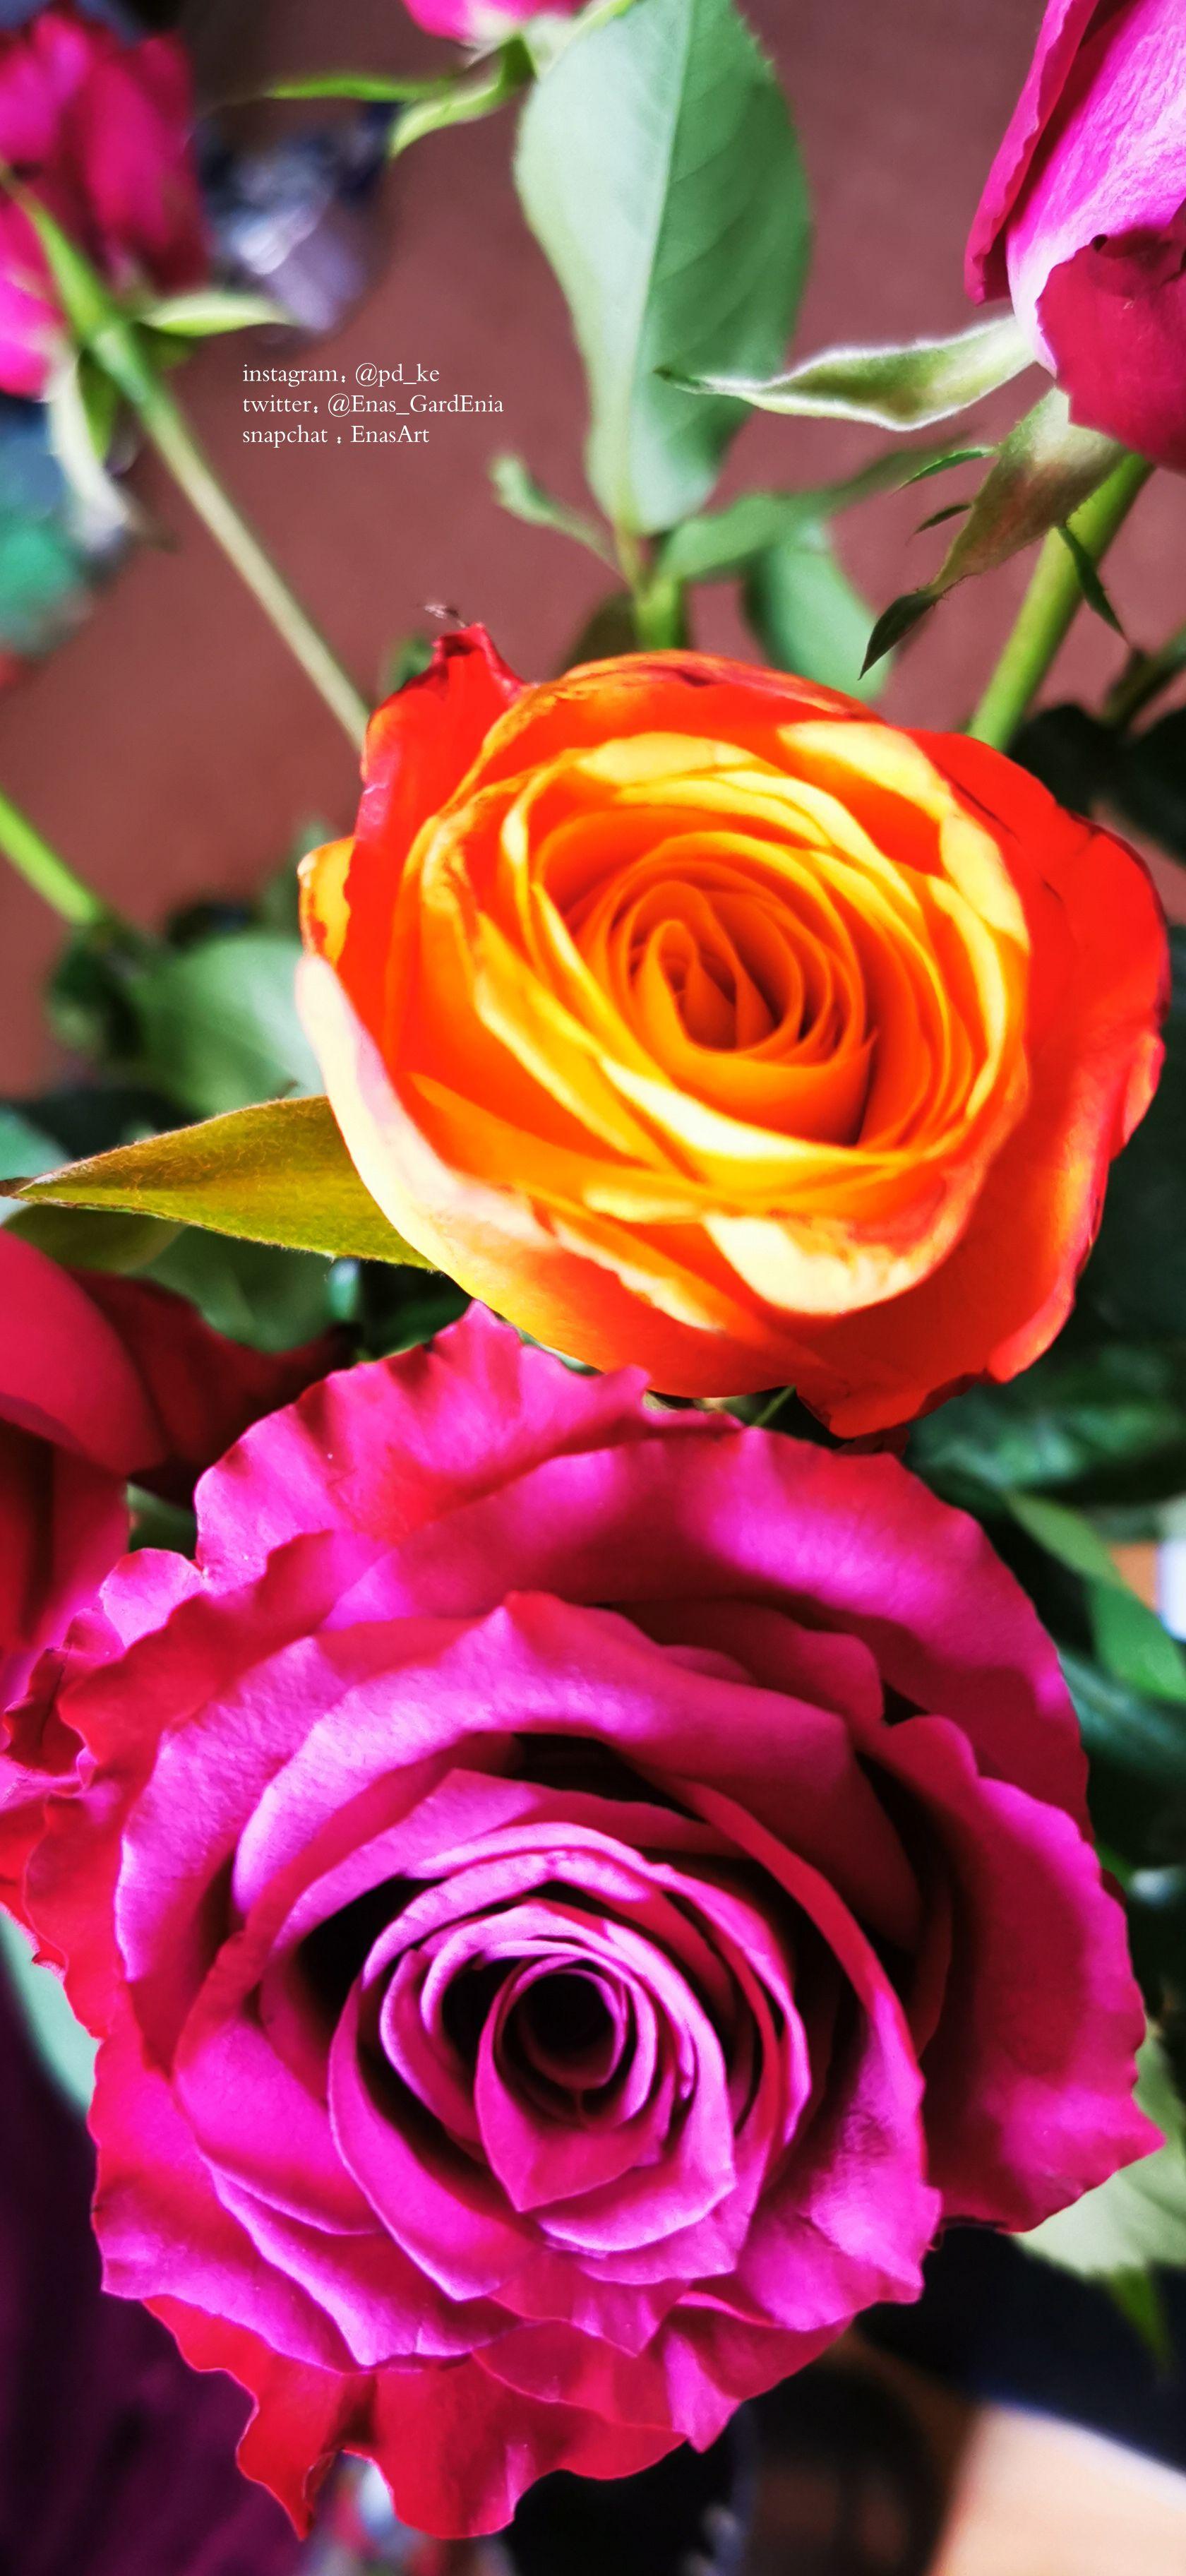 Instagram Pd Ke Twitter Enas Gardenia Snapchat Enasart Www Instagram Com Pd Ke تصويري ايناس الغاردينيا تصوير جوال تصو In 2020 Rose Flowers Plants